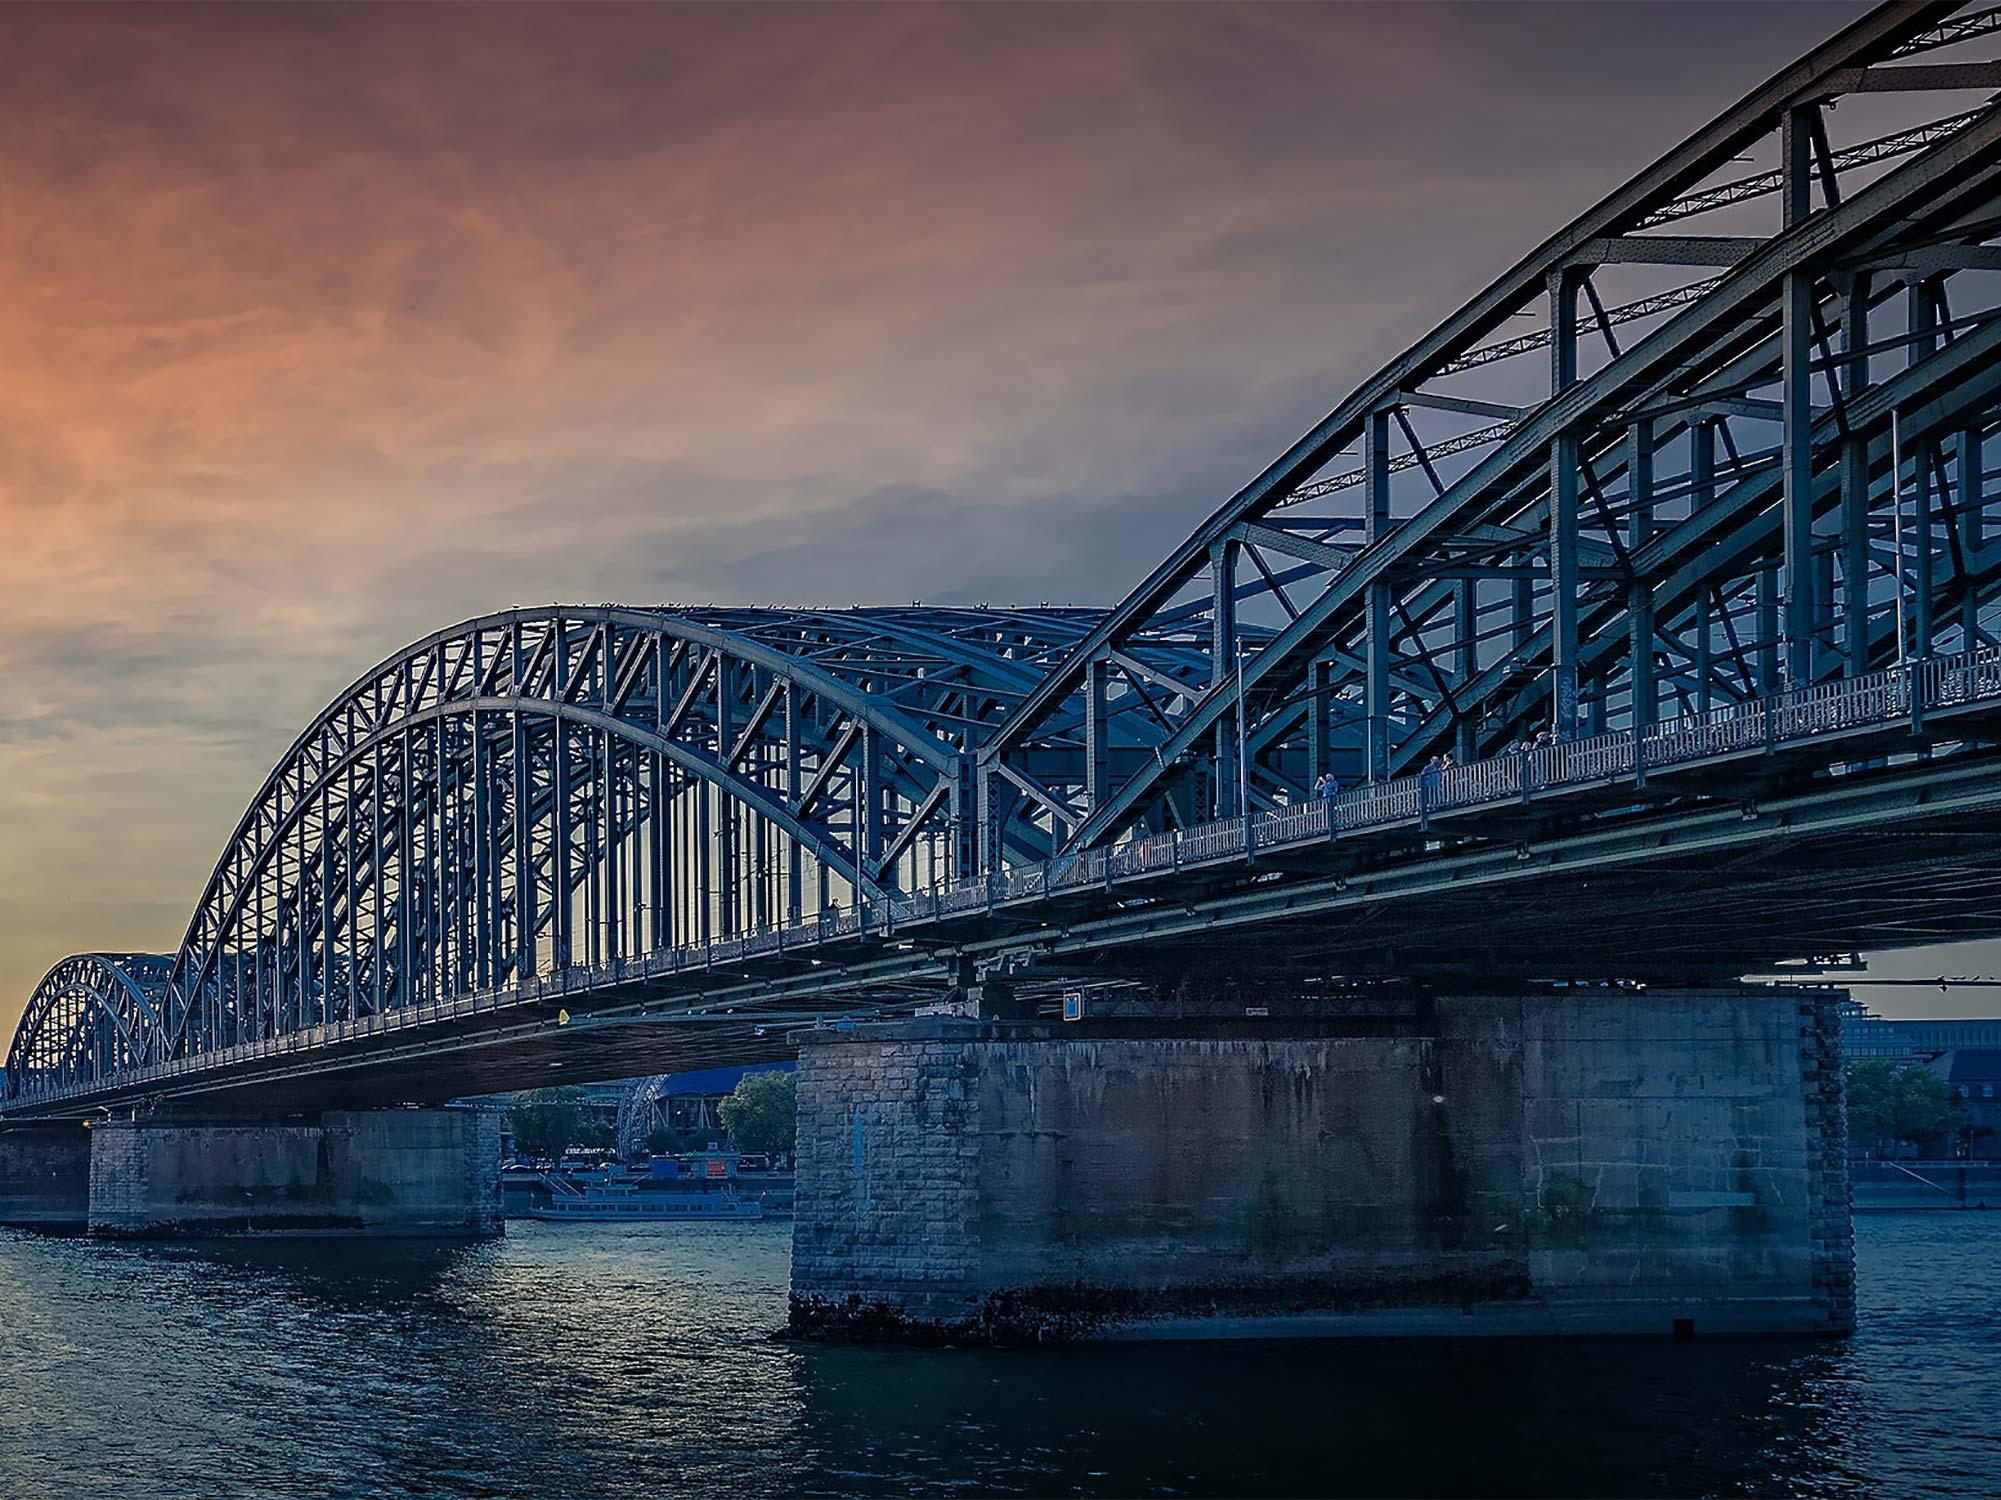 bridge over water at sunset